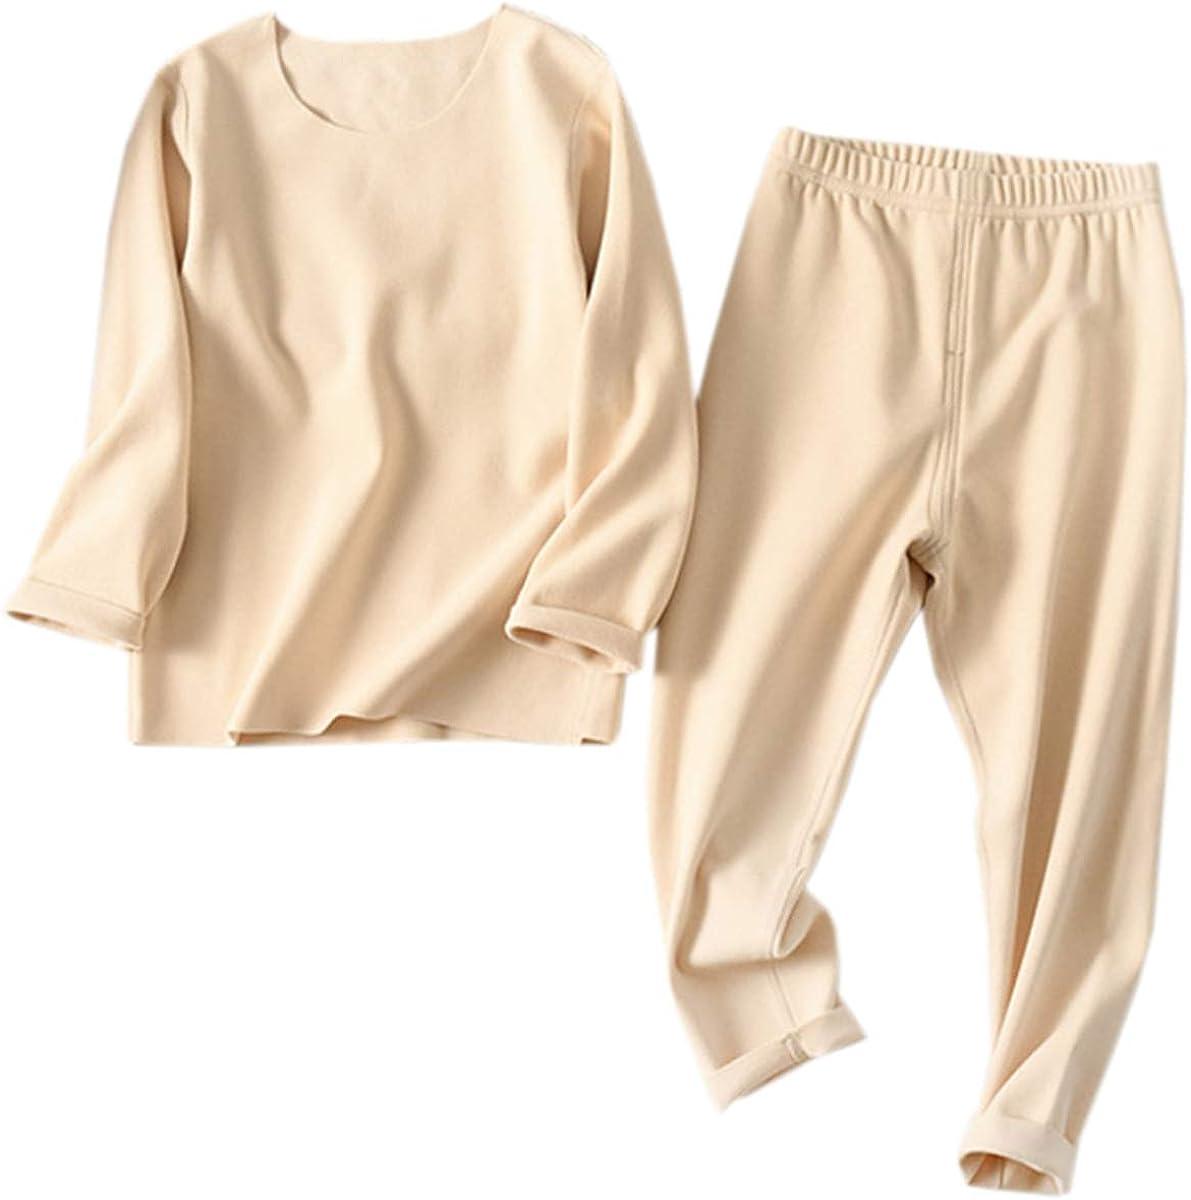 Kids Pajamas Set, Soft Thermal Striped Long Sleeve Pullover T-Shirt Tops + Matching Pants Sleepwear Loungewear Pajamas Set for Boys Girls, Solid Beige, 5-6X = Tag 140